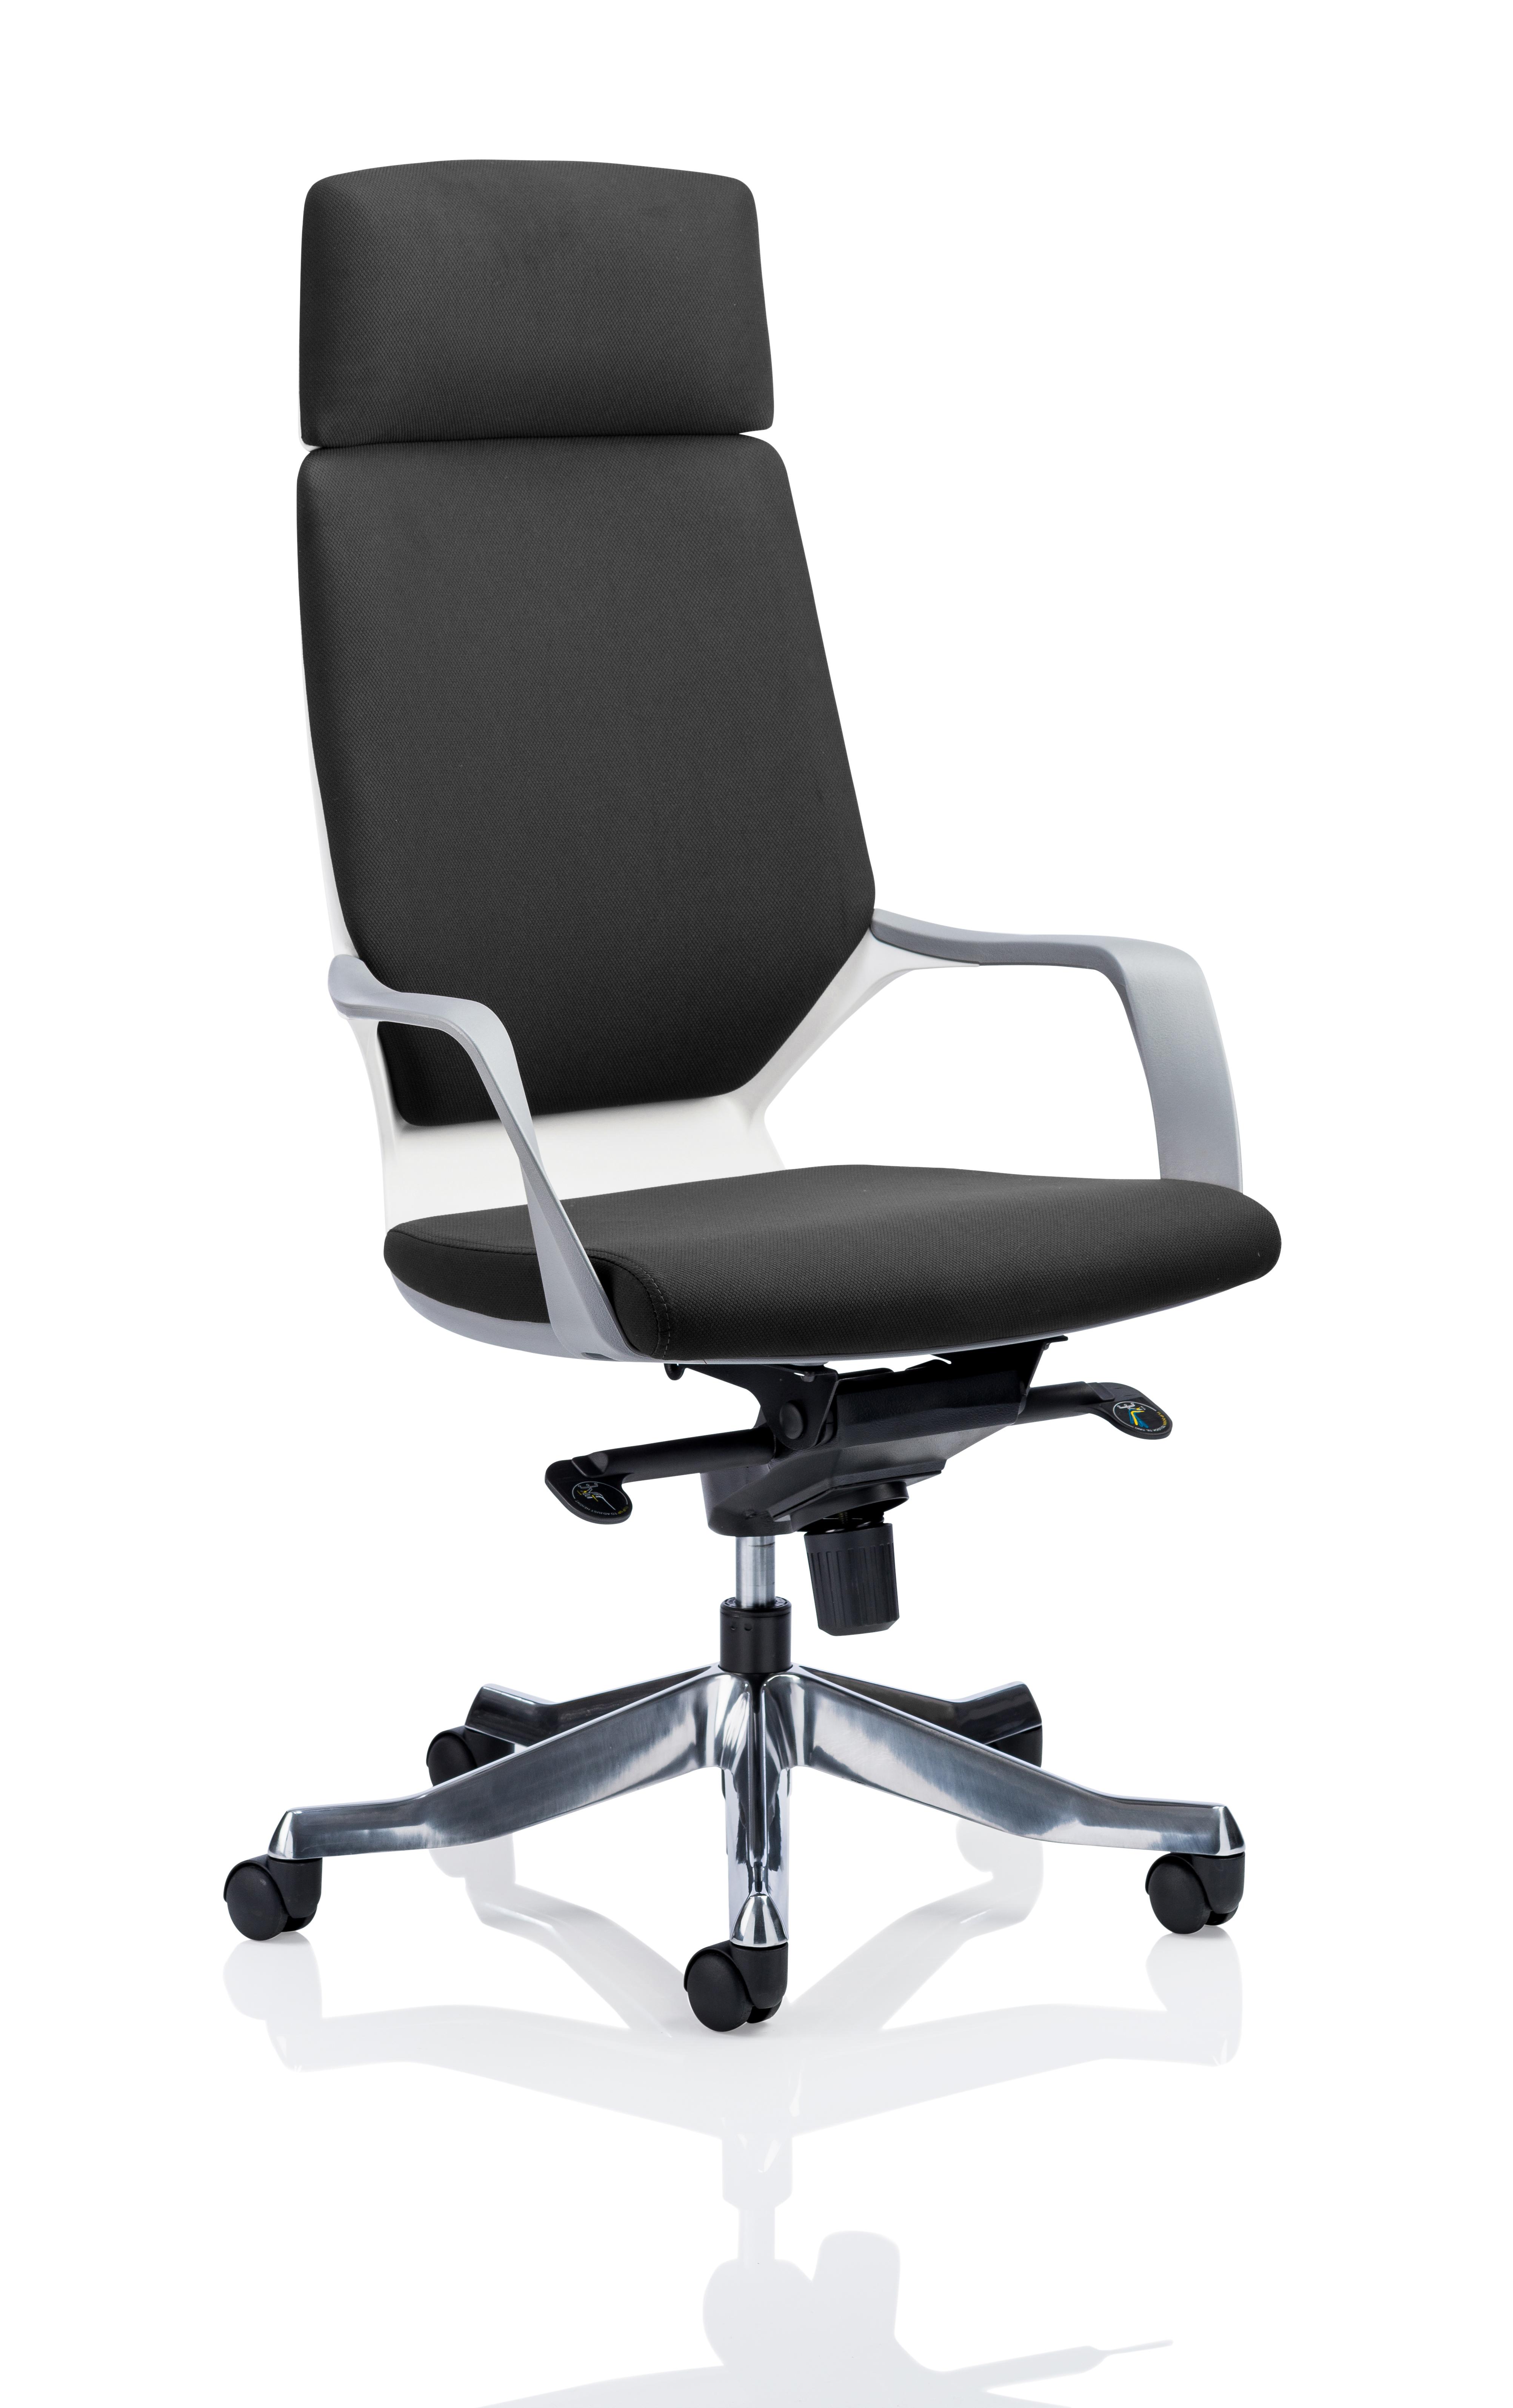 Executive Chairs Xenon White Shell High Back Black Fabric KC0226